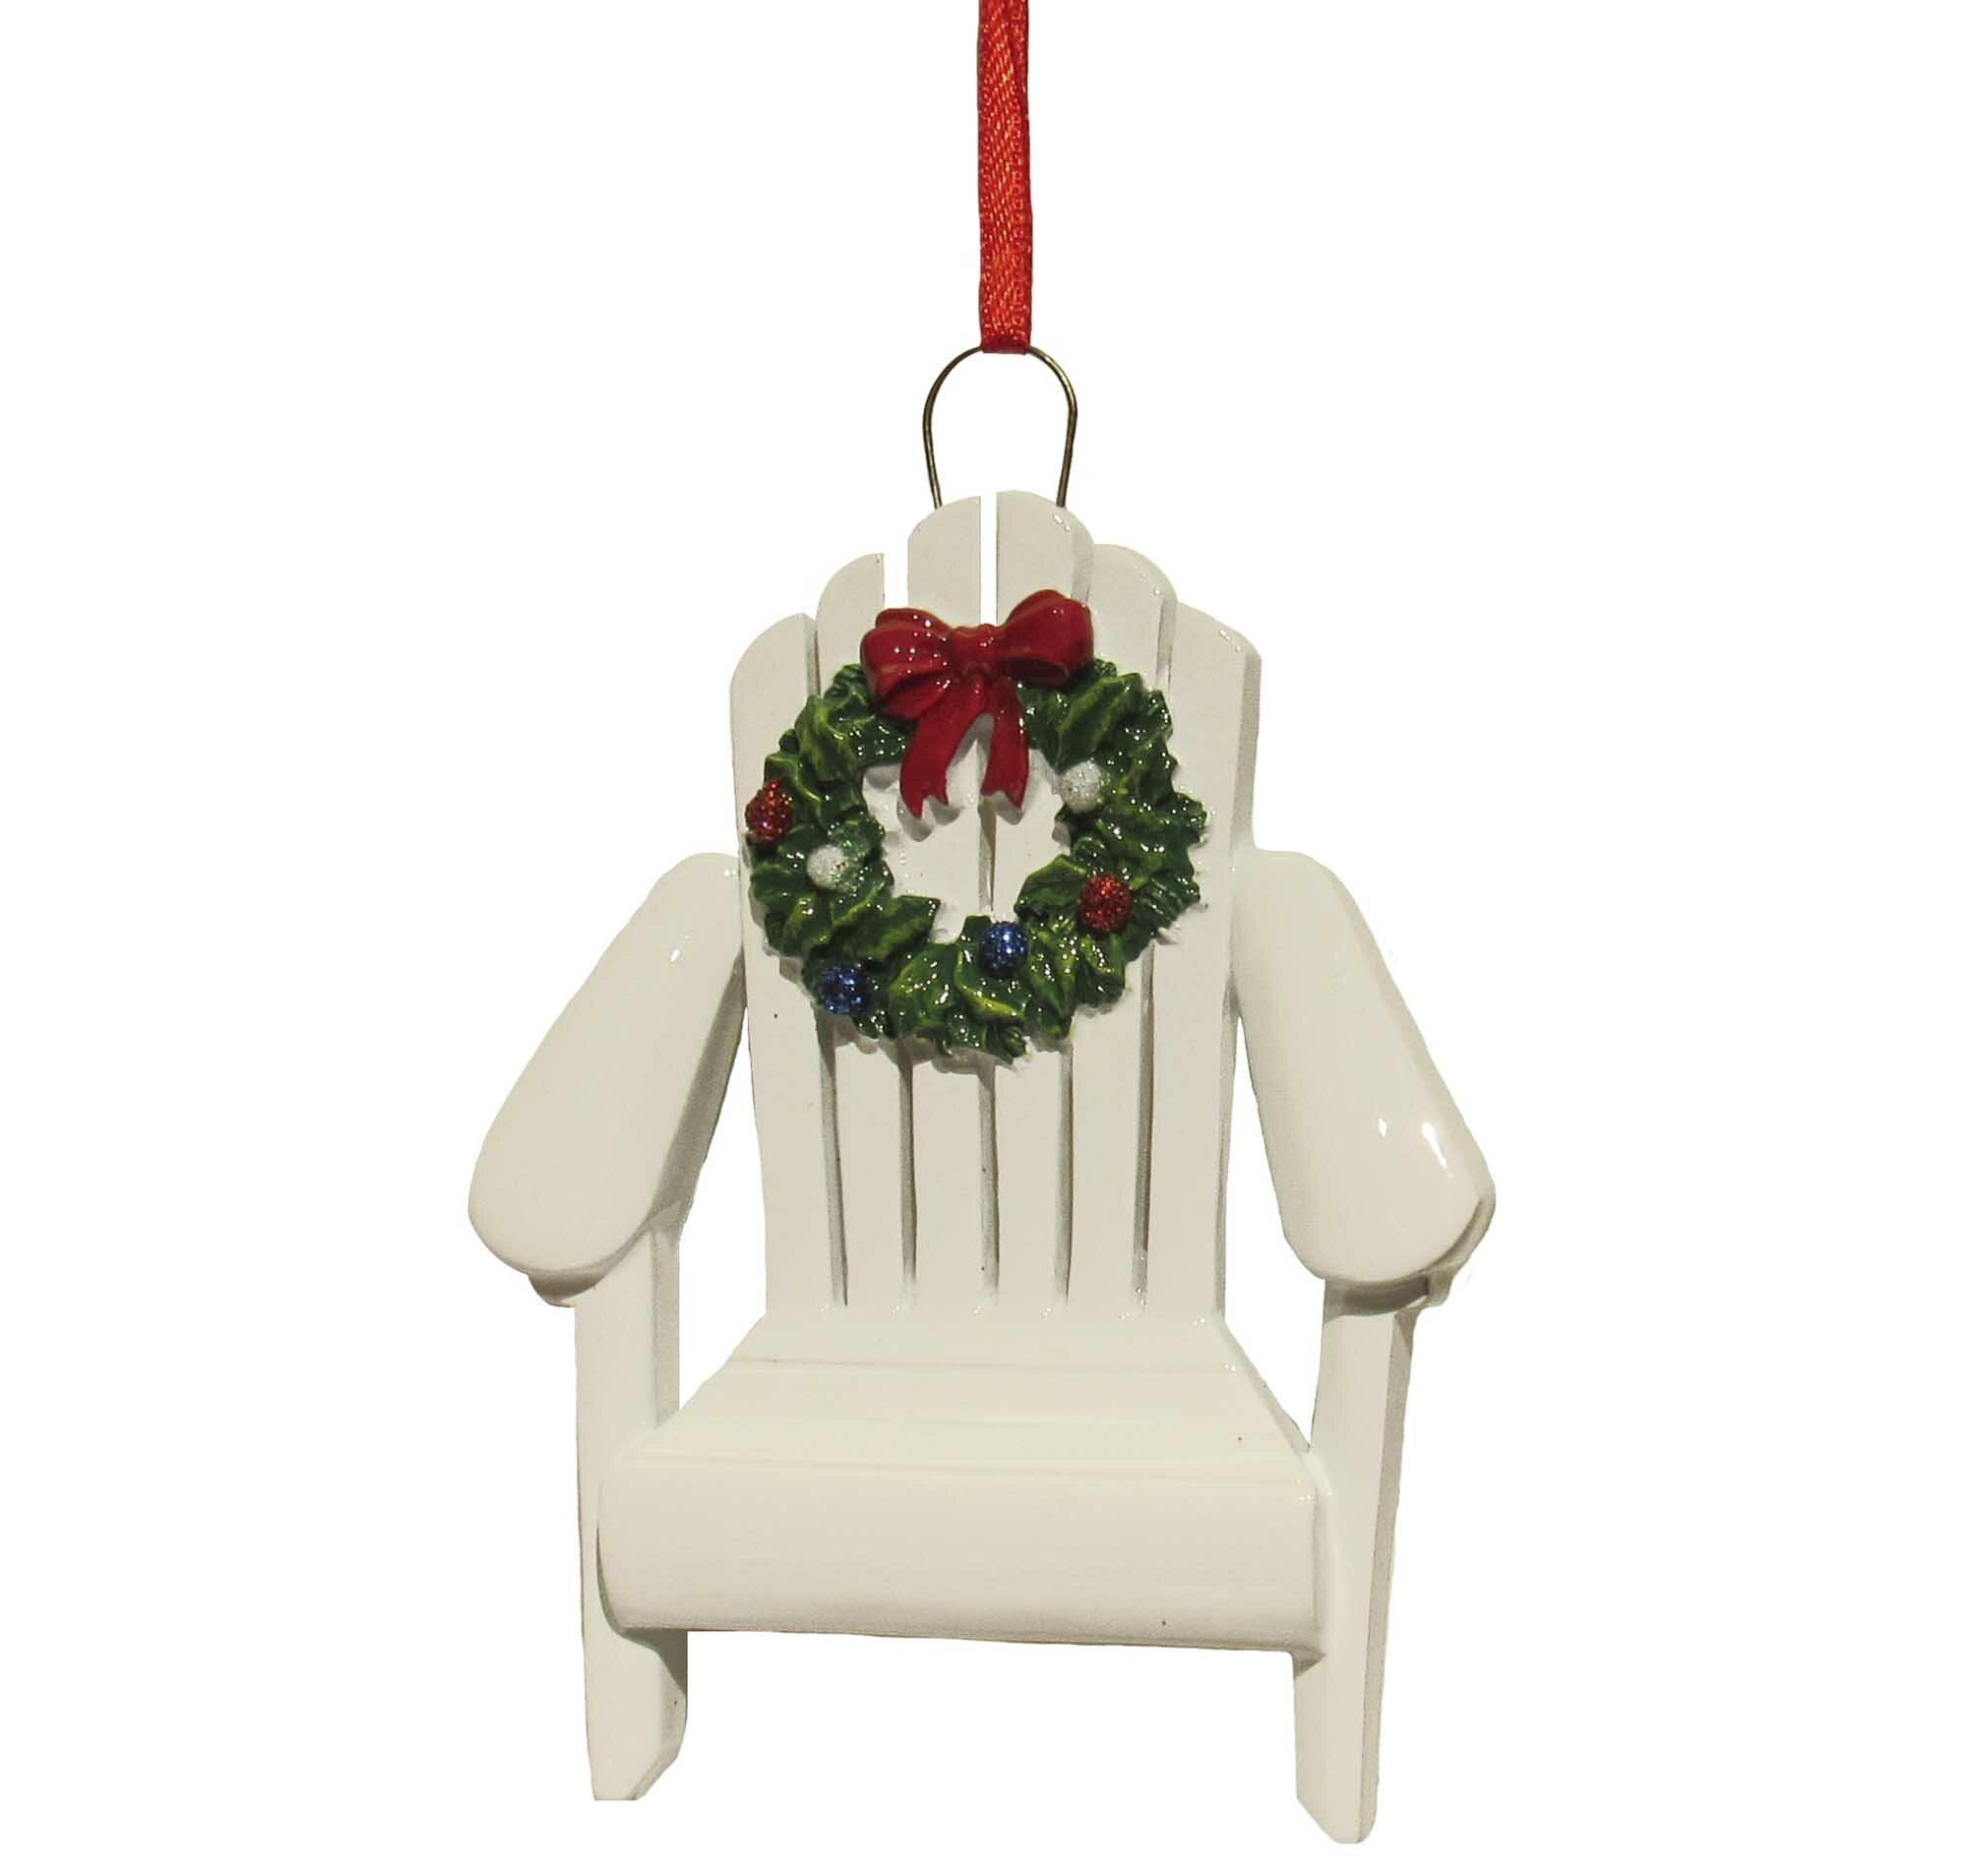 The Holiday Aisle Resin Adirondack Chair Hanging Figurine Ornament Reviews Wayfair